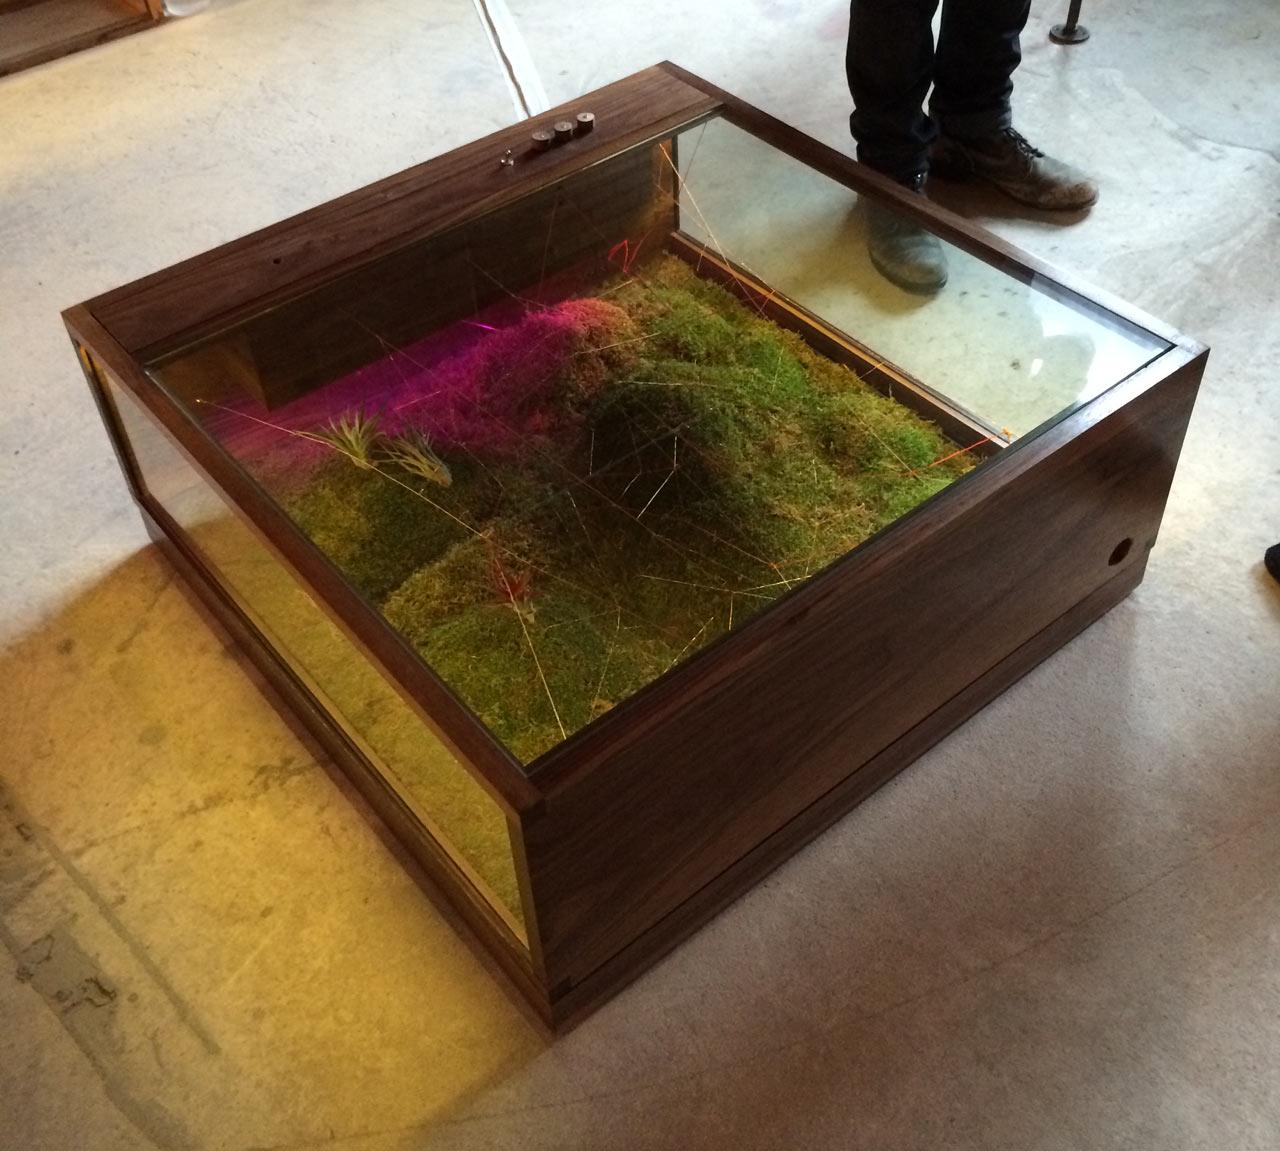 huy-bui-table-terrarium